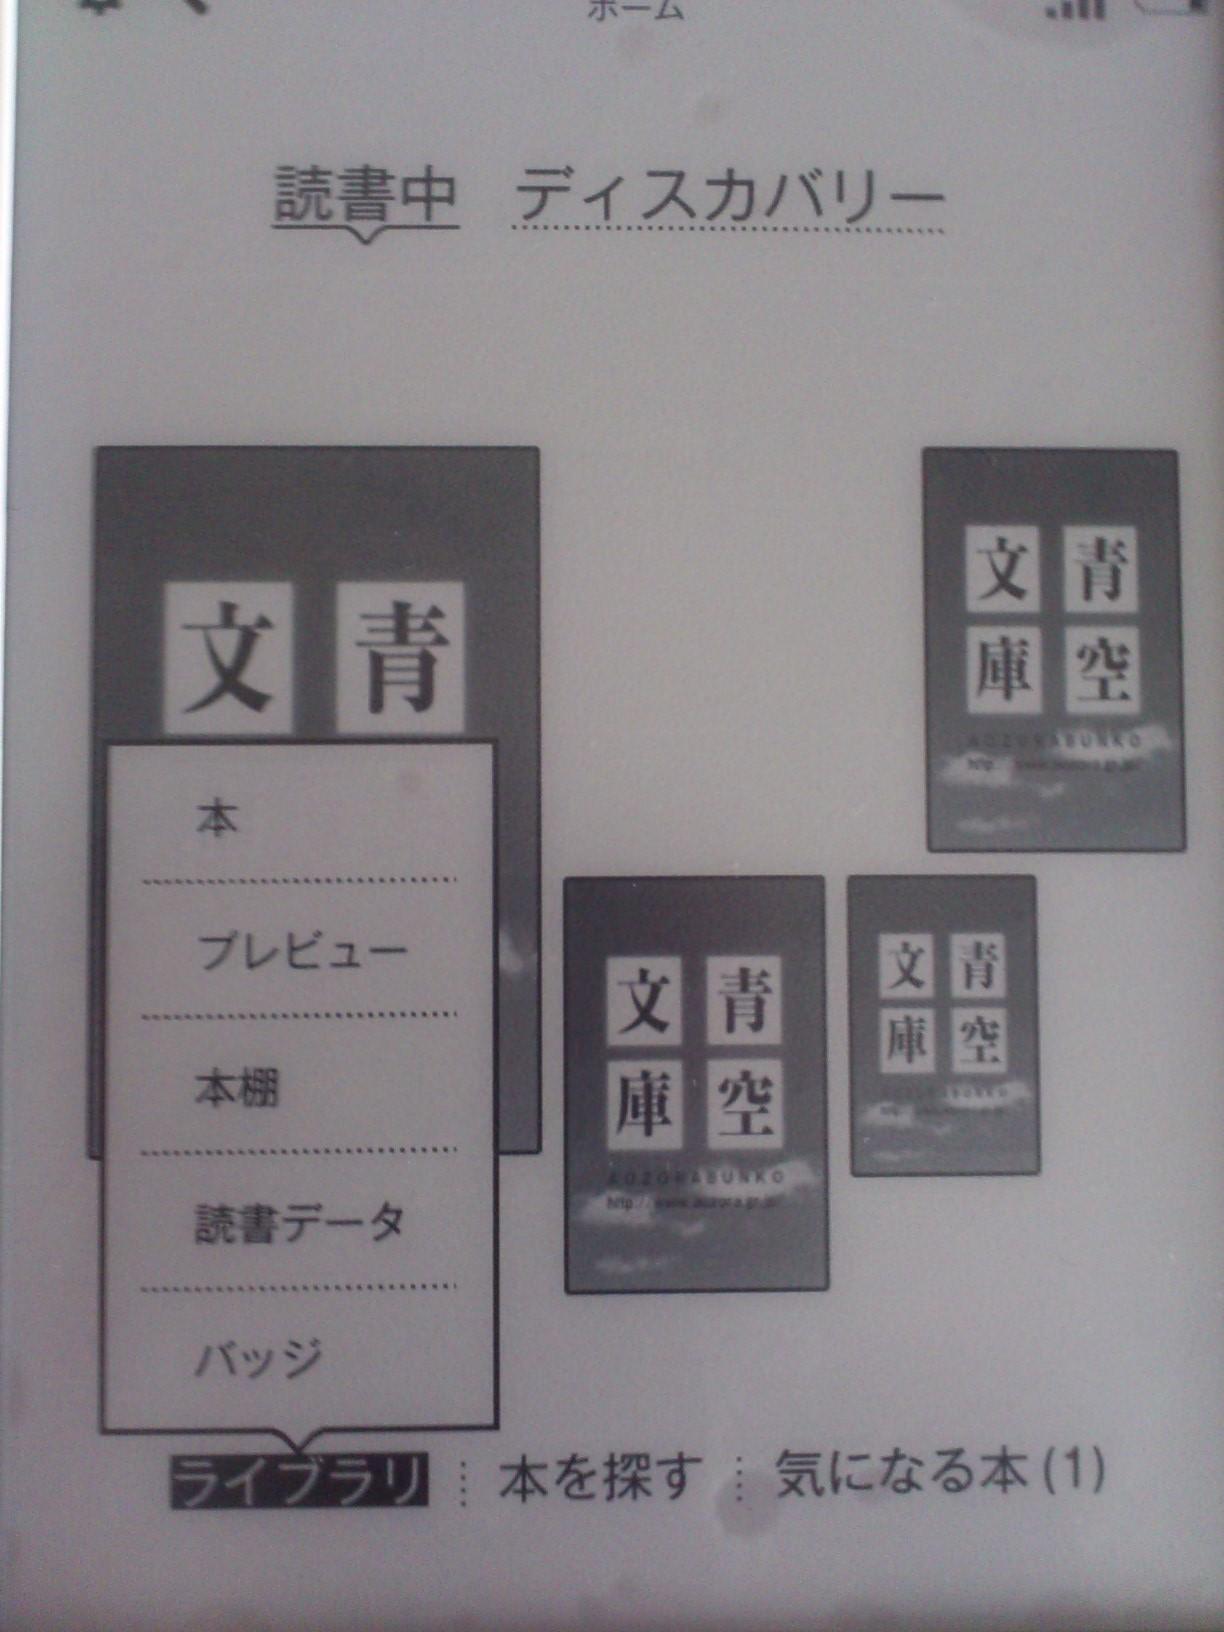 Kobo_book.jpg